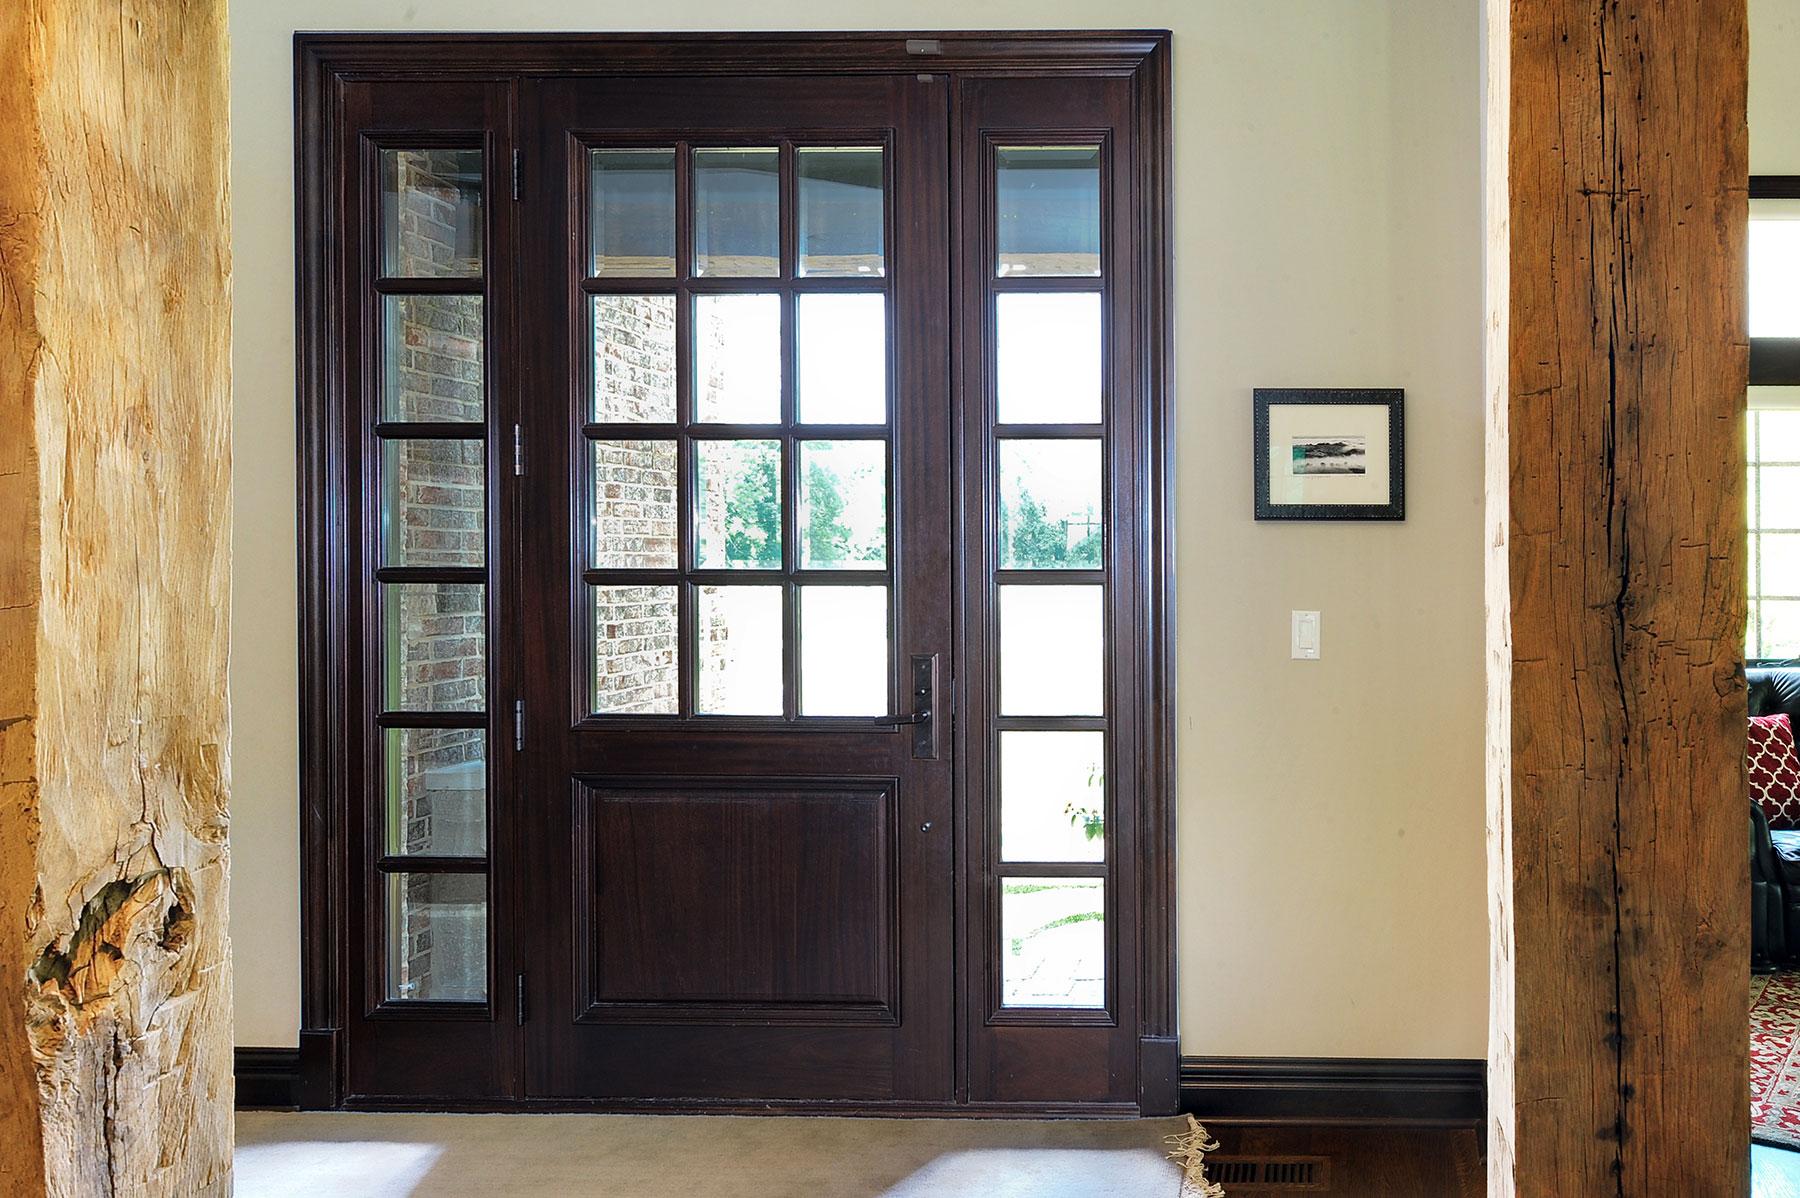 Glenview haus custom front door design a growing trend in for Custom transom